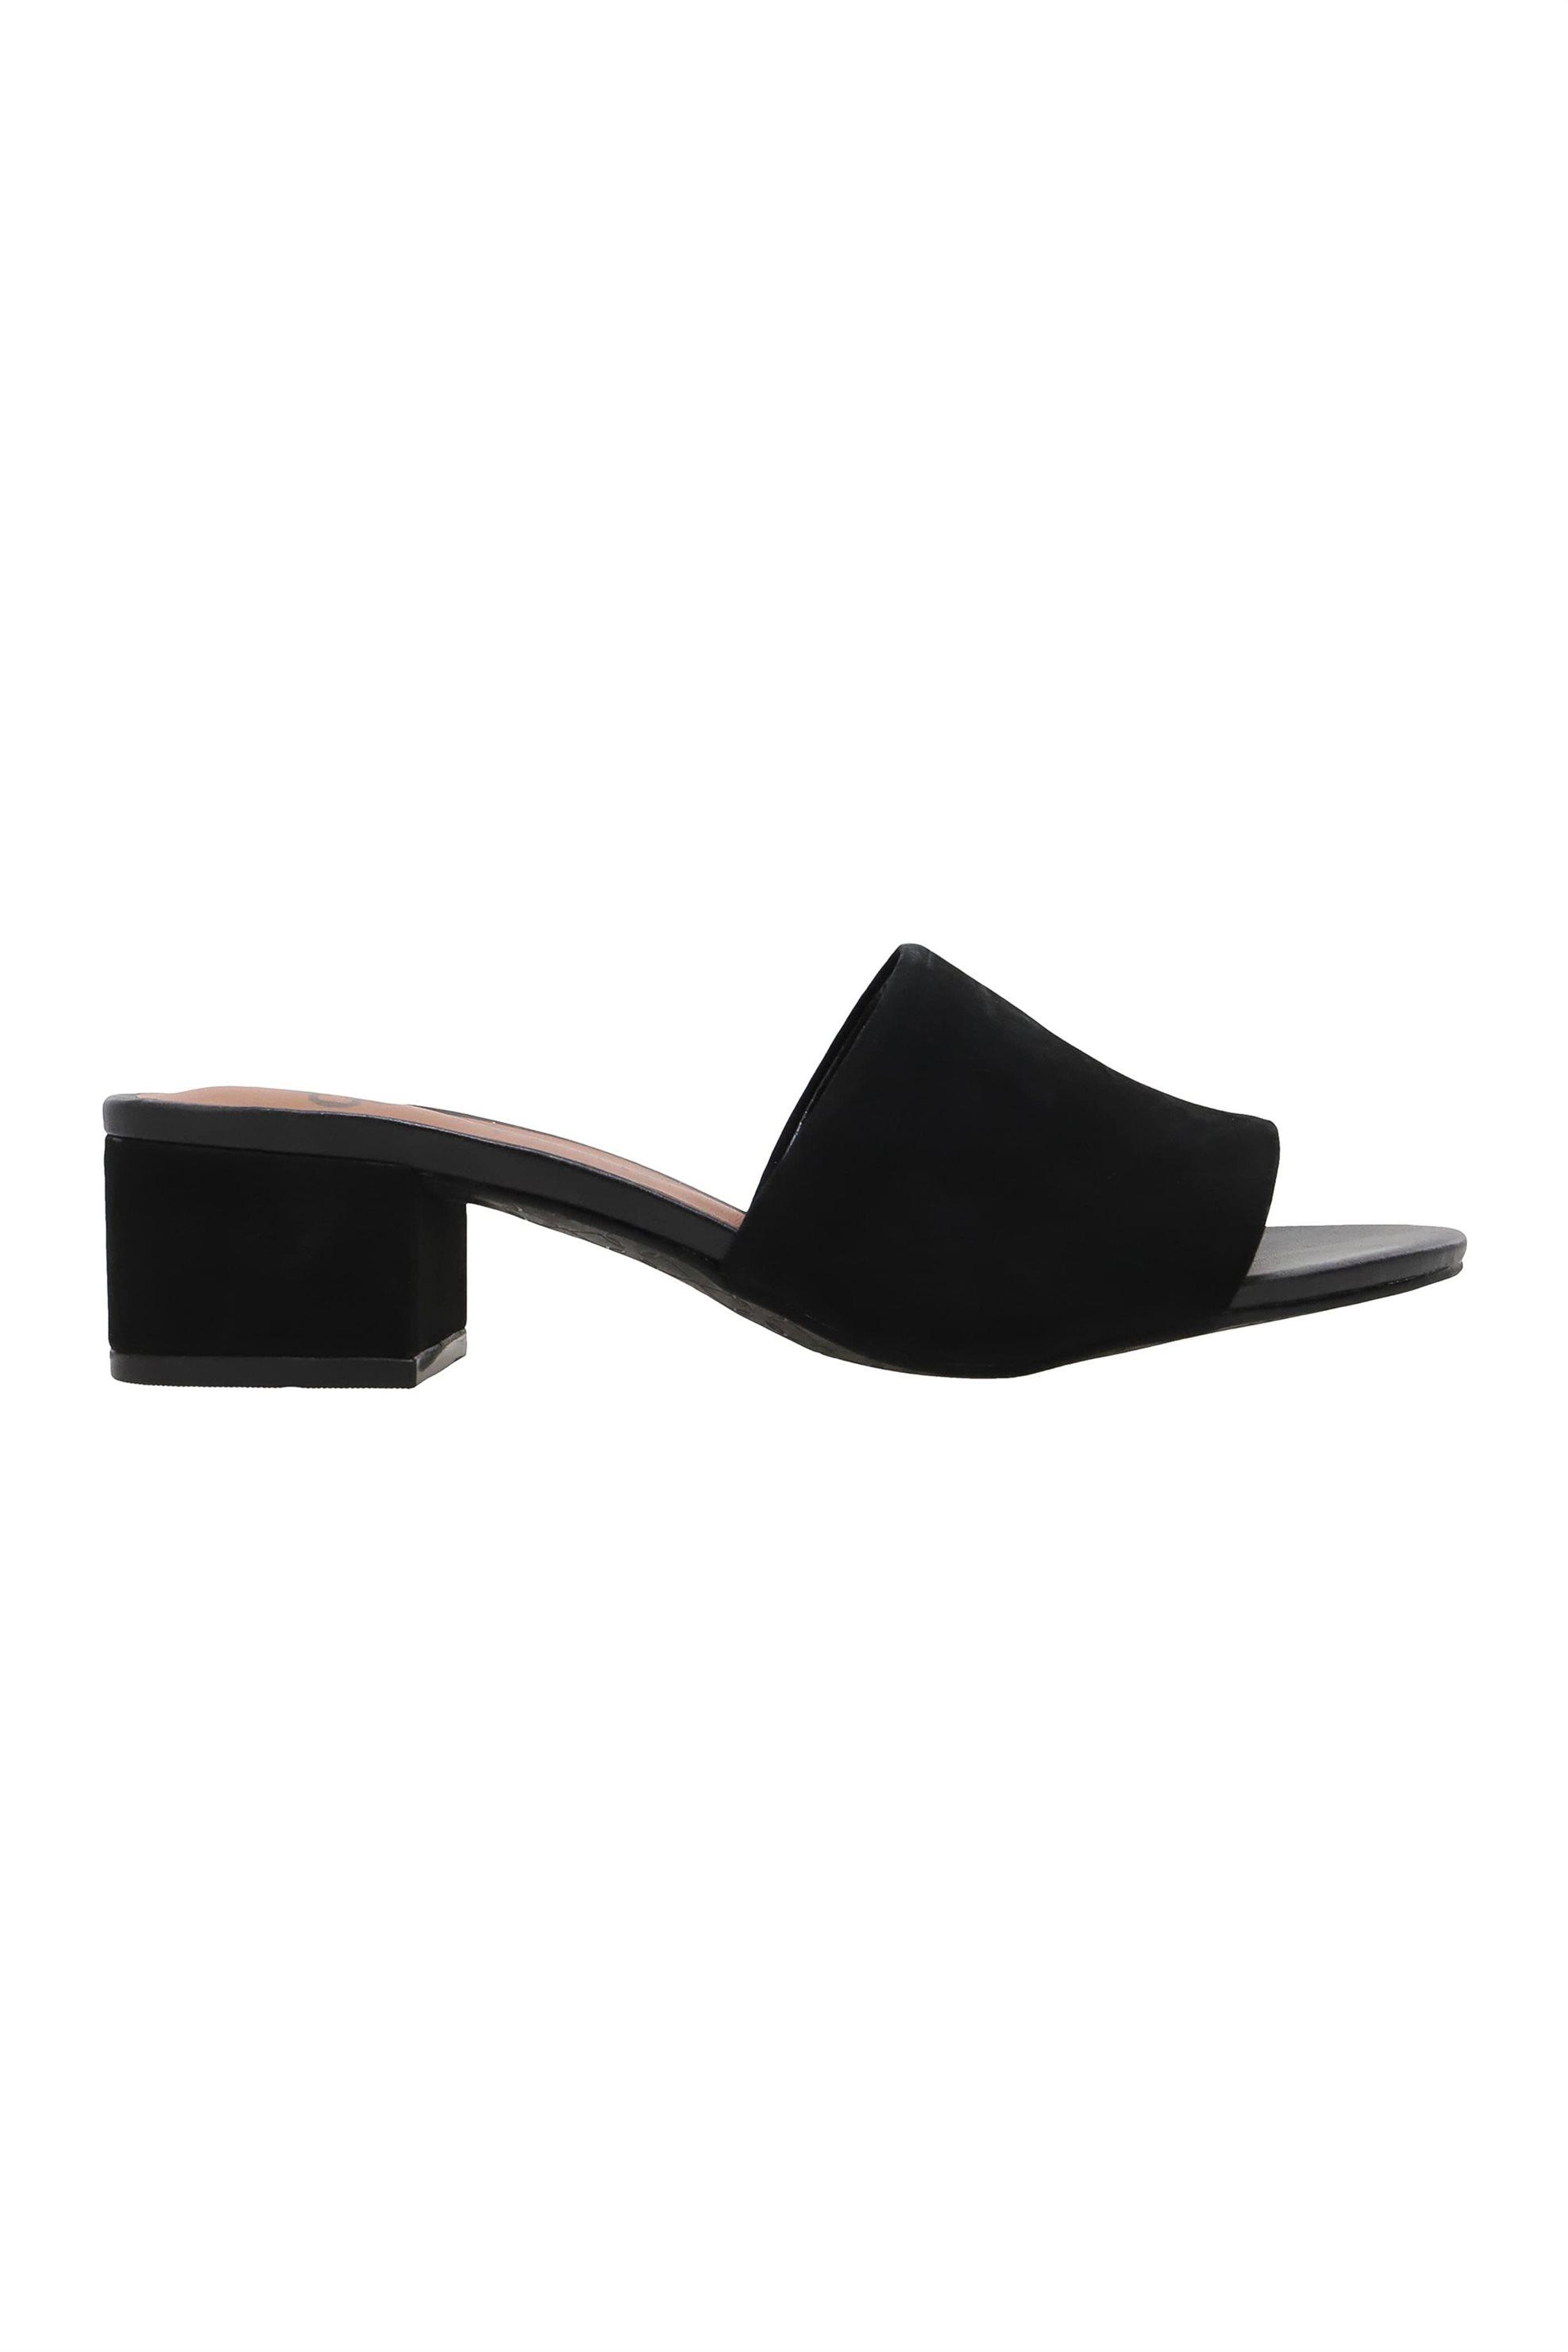 Capodarte γυναικεία δερμάτινα mules μονόχρωμα - 4014277 - Μαύρο